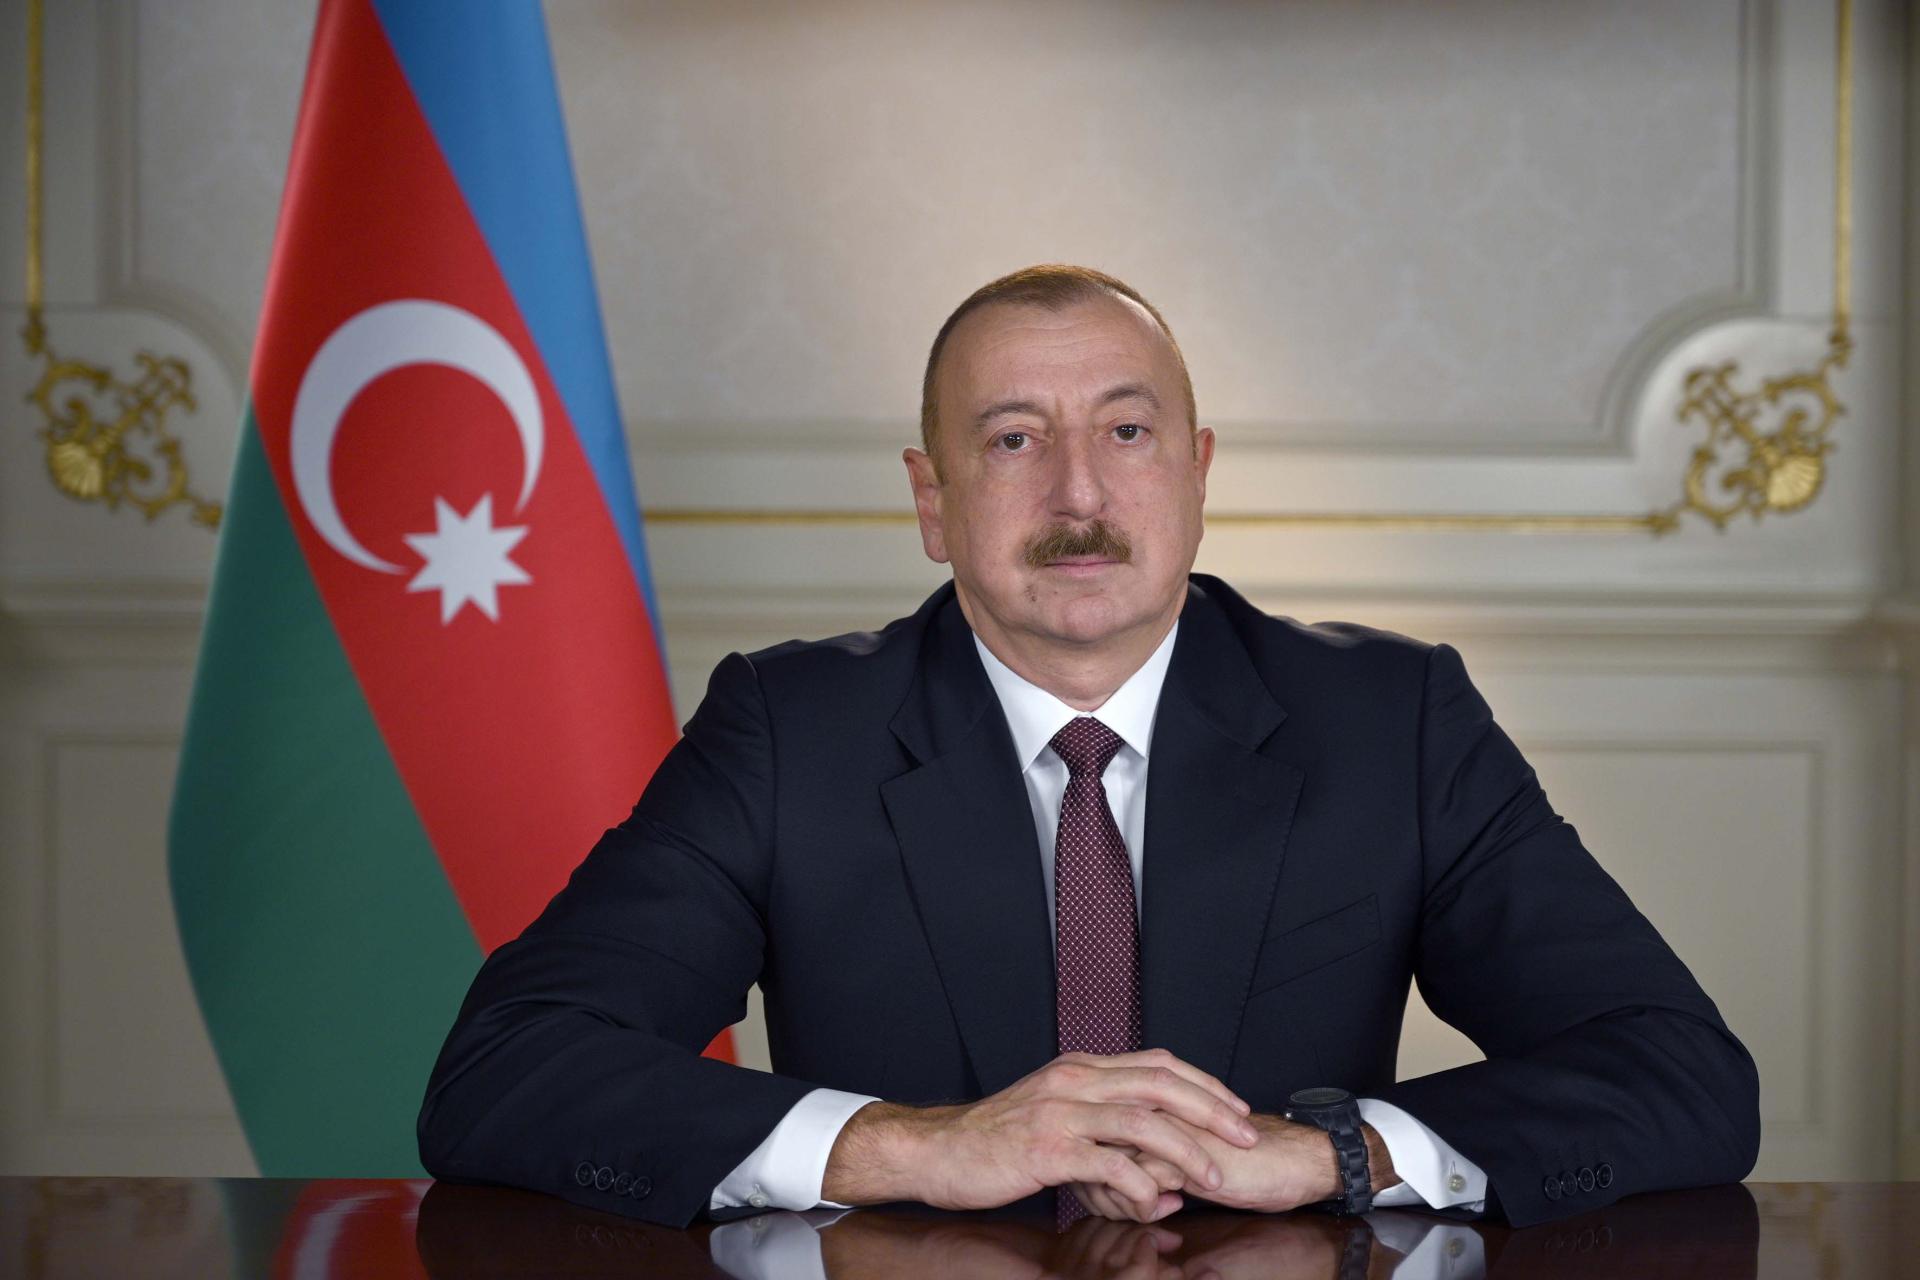 2020/06/ilham_aliyev_main_new_president_310120_1_1591039089.jpg